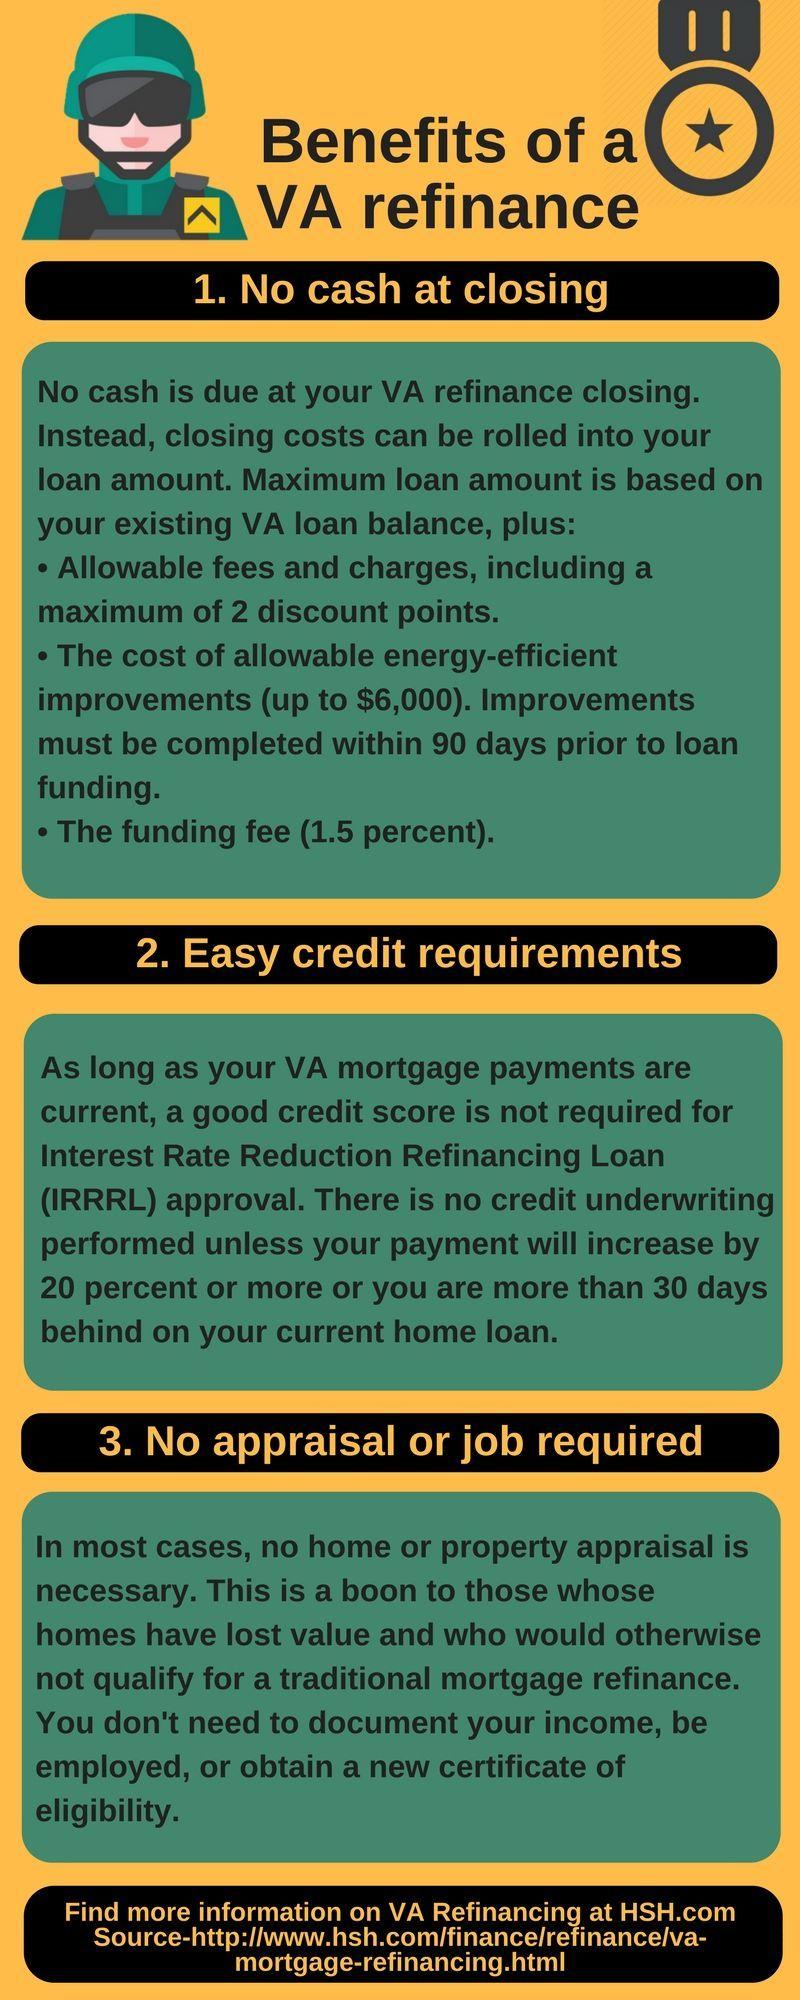 Benefits of a VA refinance.